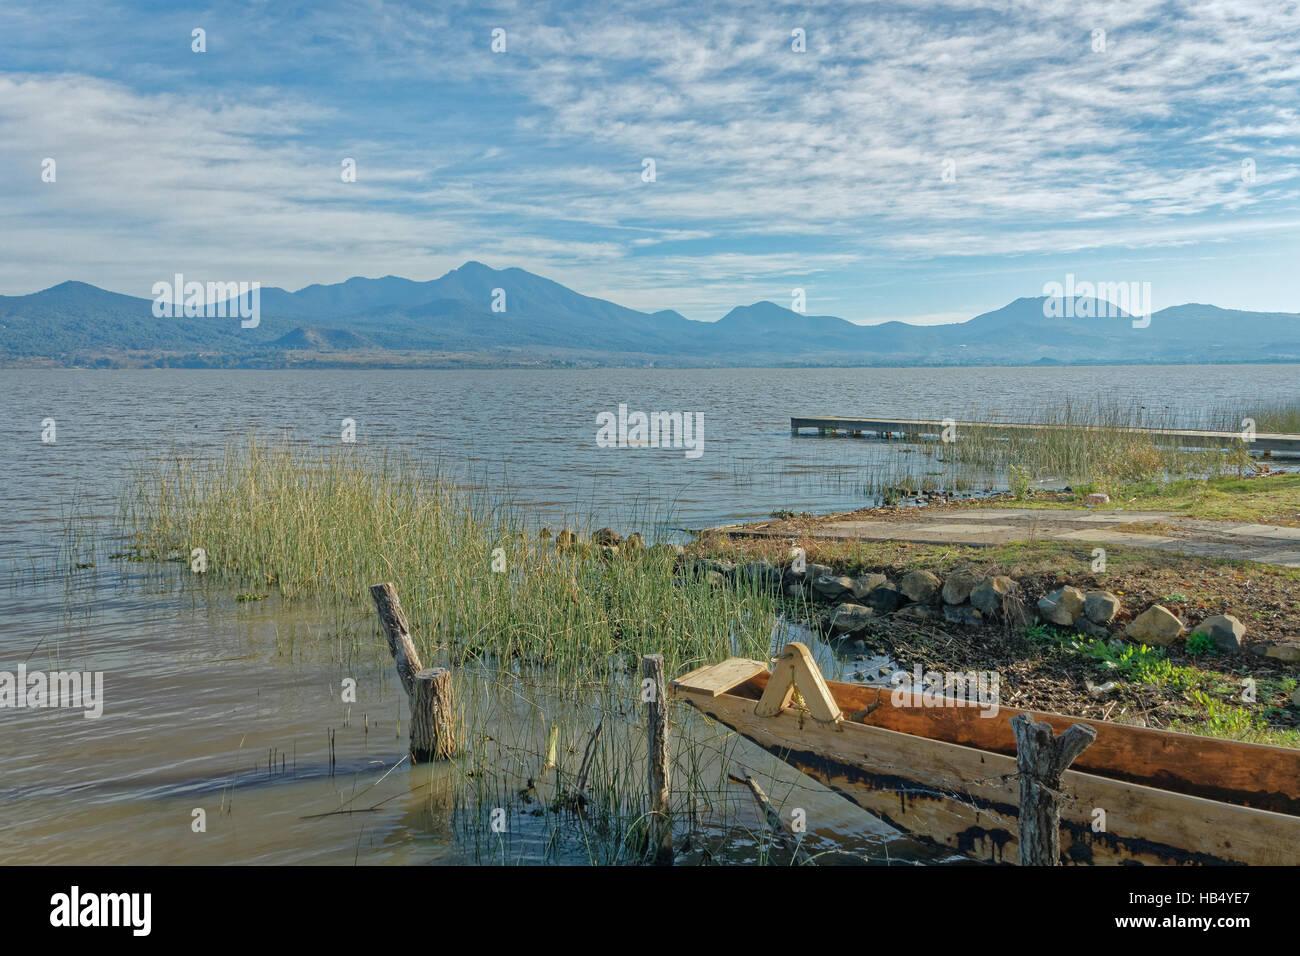 Lake Patzcuaro, Michoacan, Mexico - Stock Image